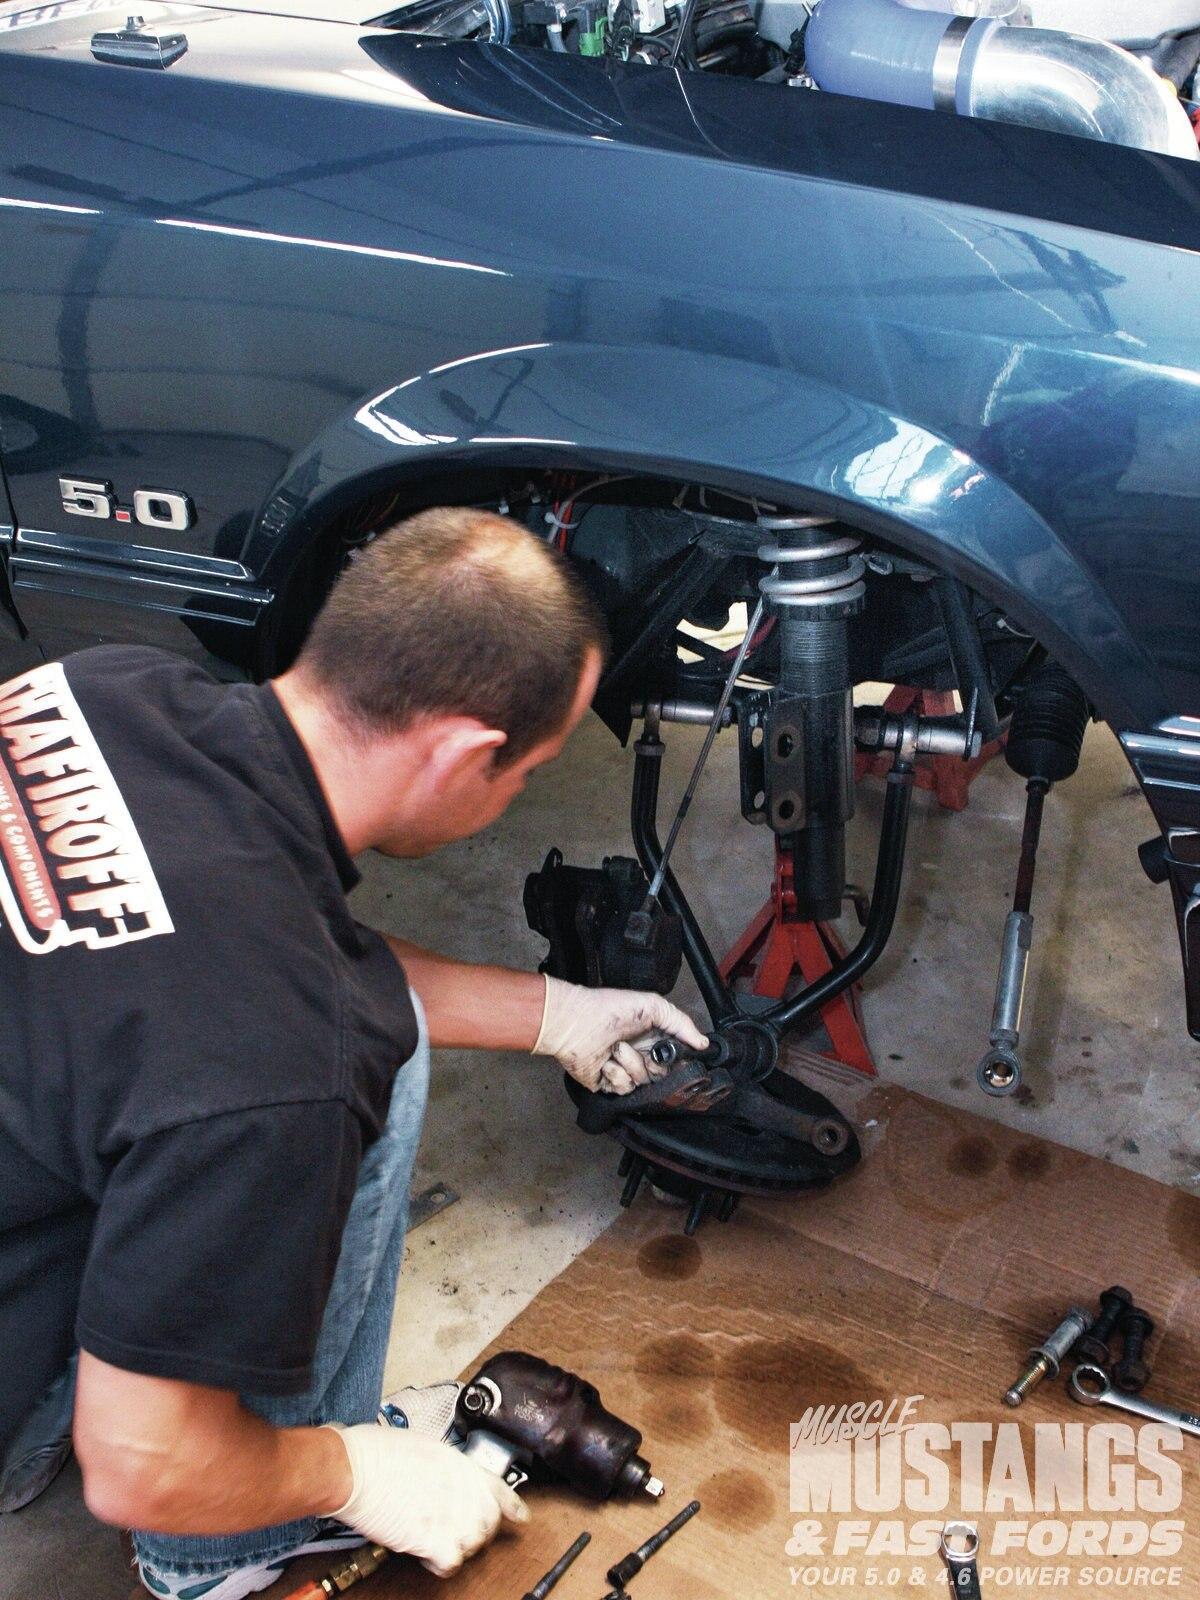 Mmfp 1110 Tech Ss4 Drag Spec Braking System Draggin The Brakes 005